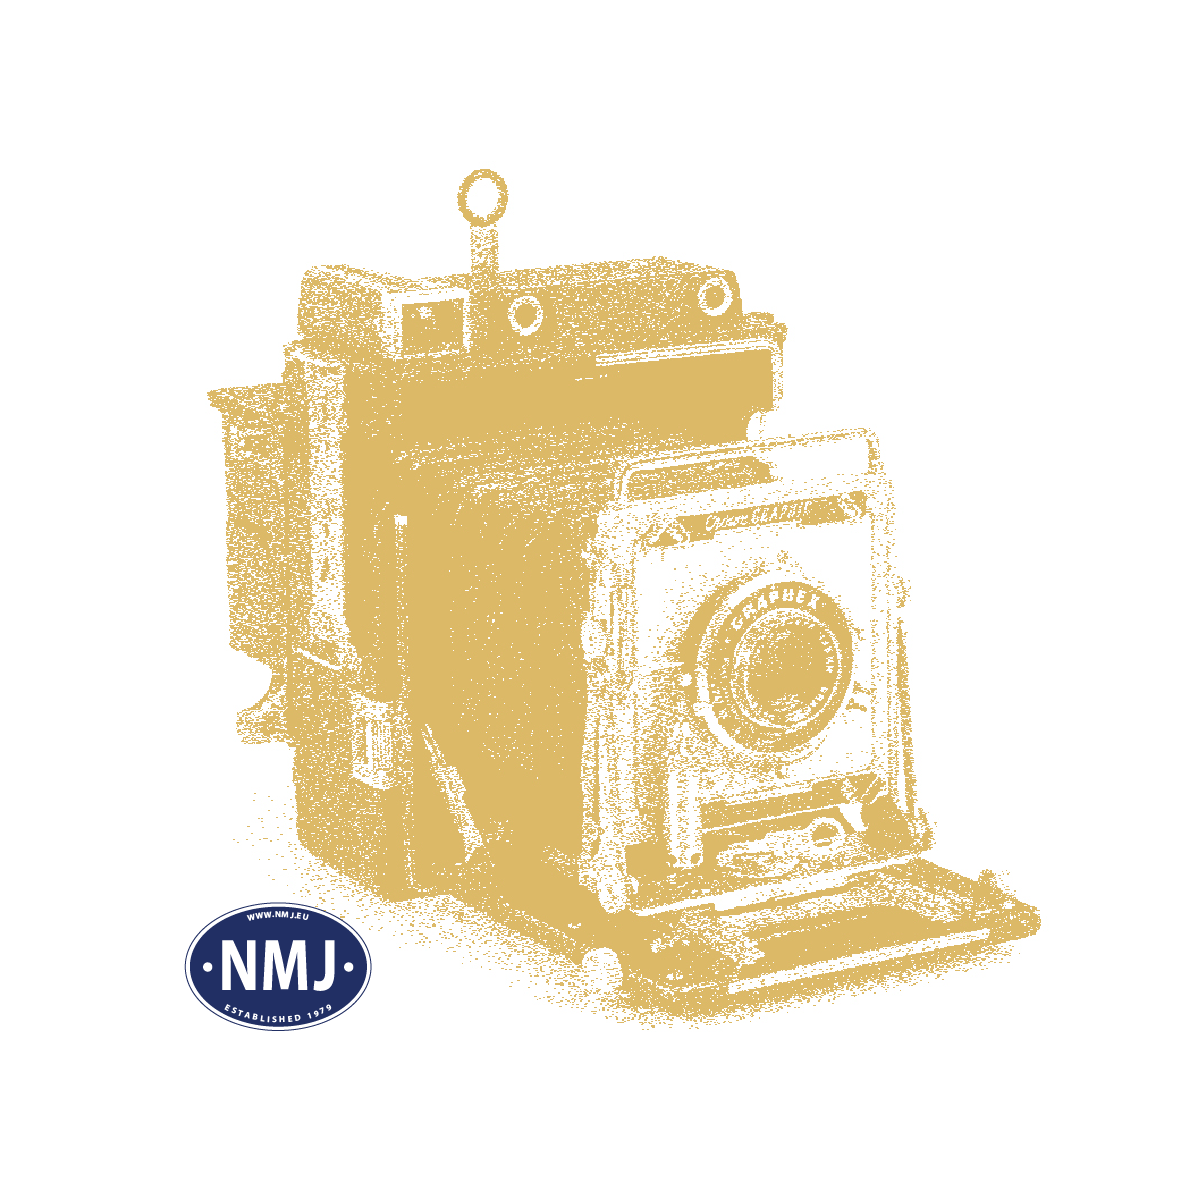 ROC73428 - Elektrolokomotive EL18.2257 der NSB, rot/silber,grau, Foto-Design, DC